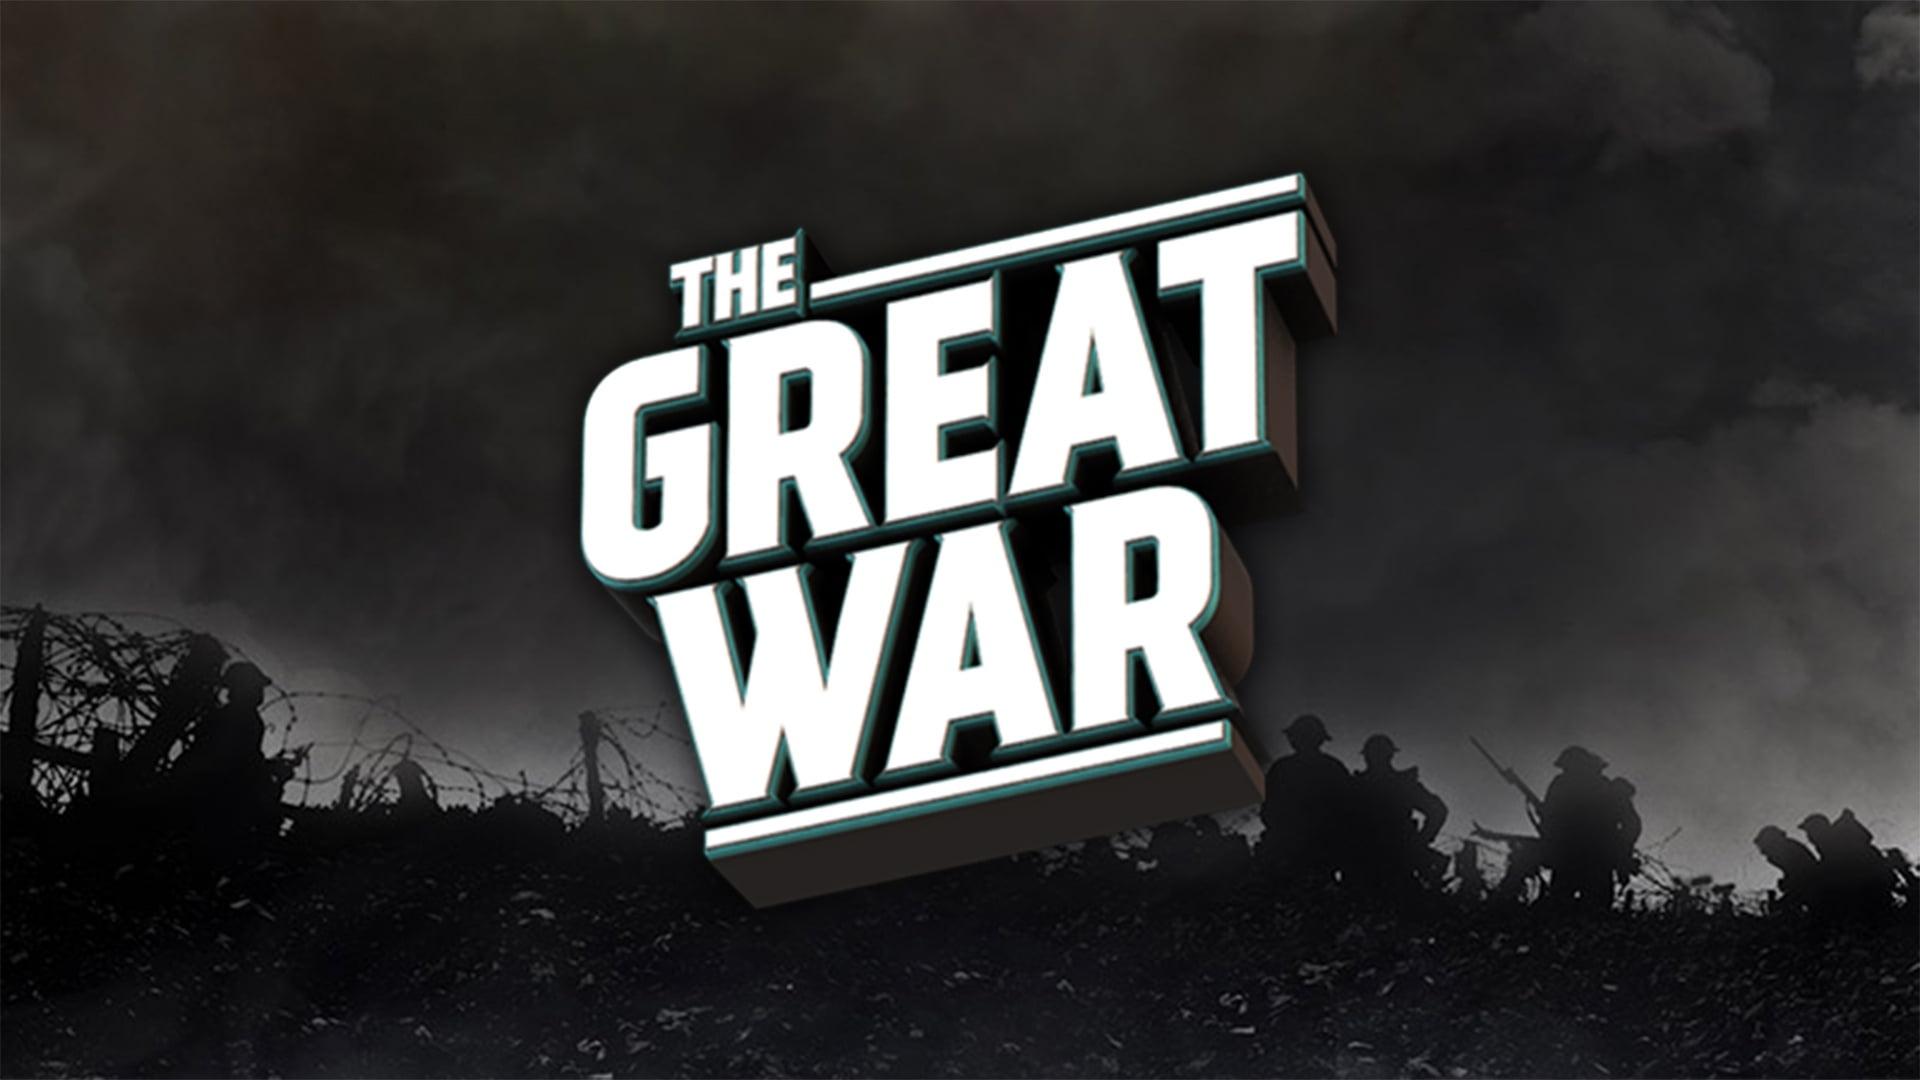 The Great War -- Week 1